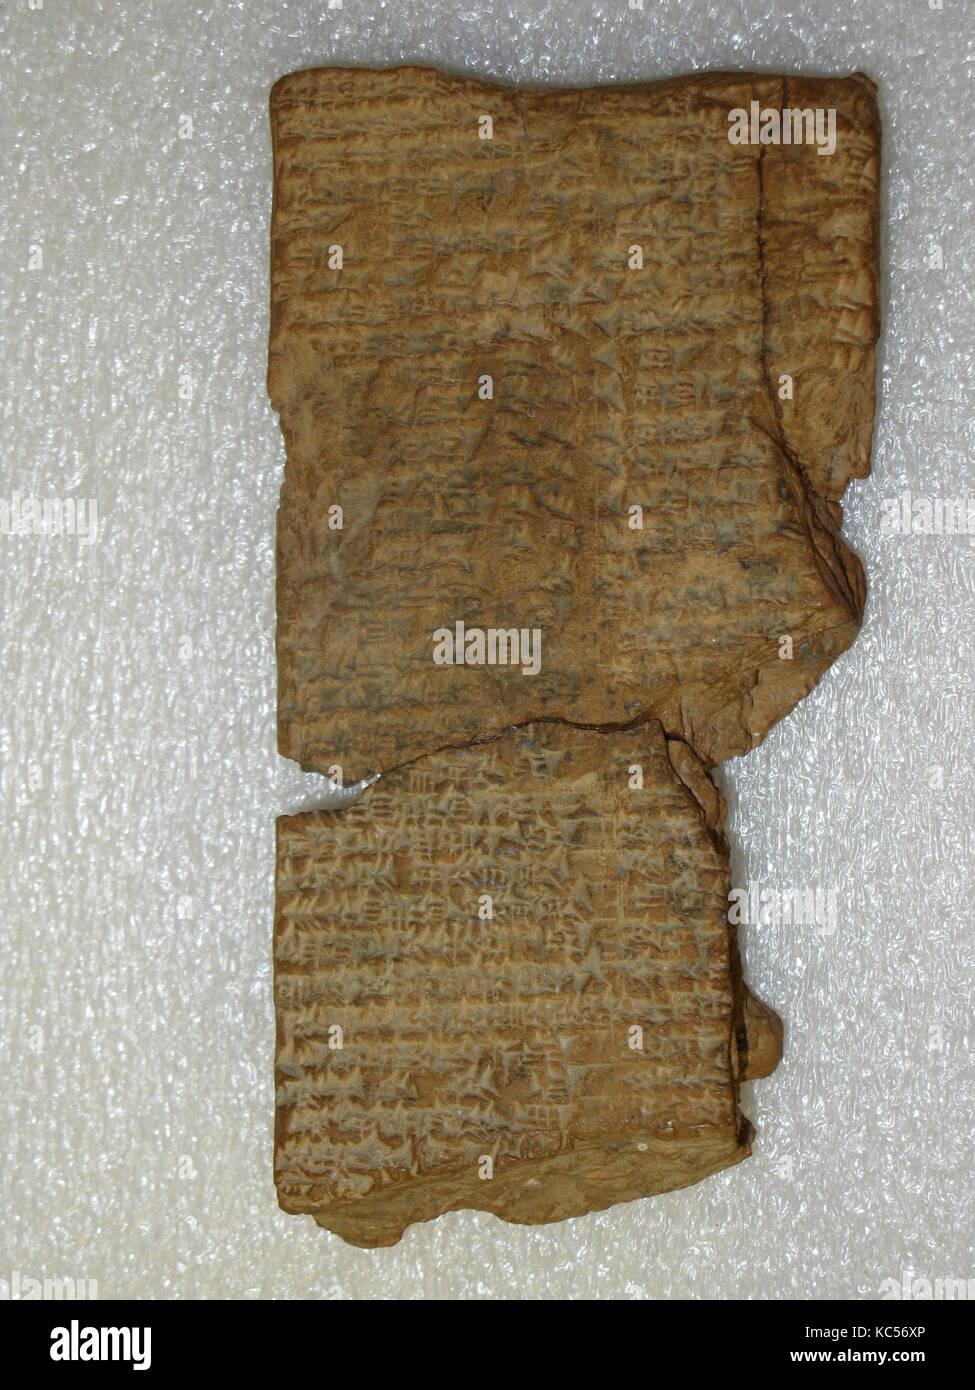 Cuneiform tablet: nir-gal lu e-NE, balag to Ninurta, ca. 2nd–1st century B.C - Stock Image